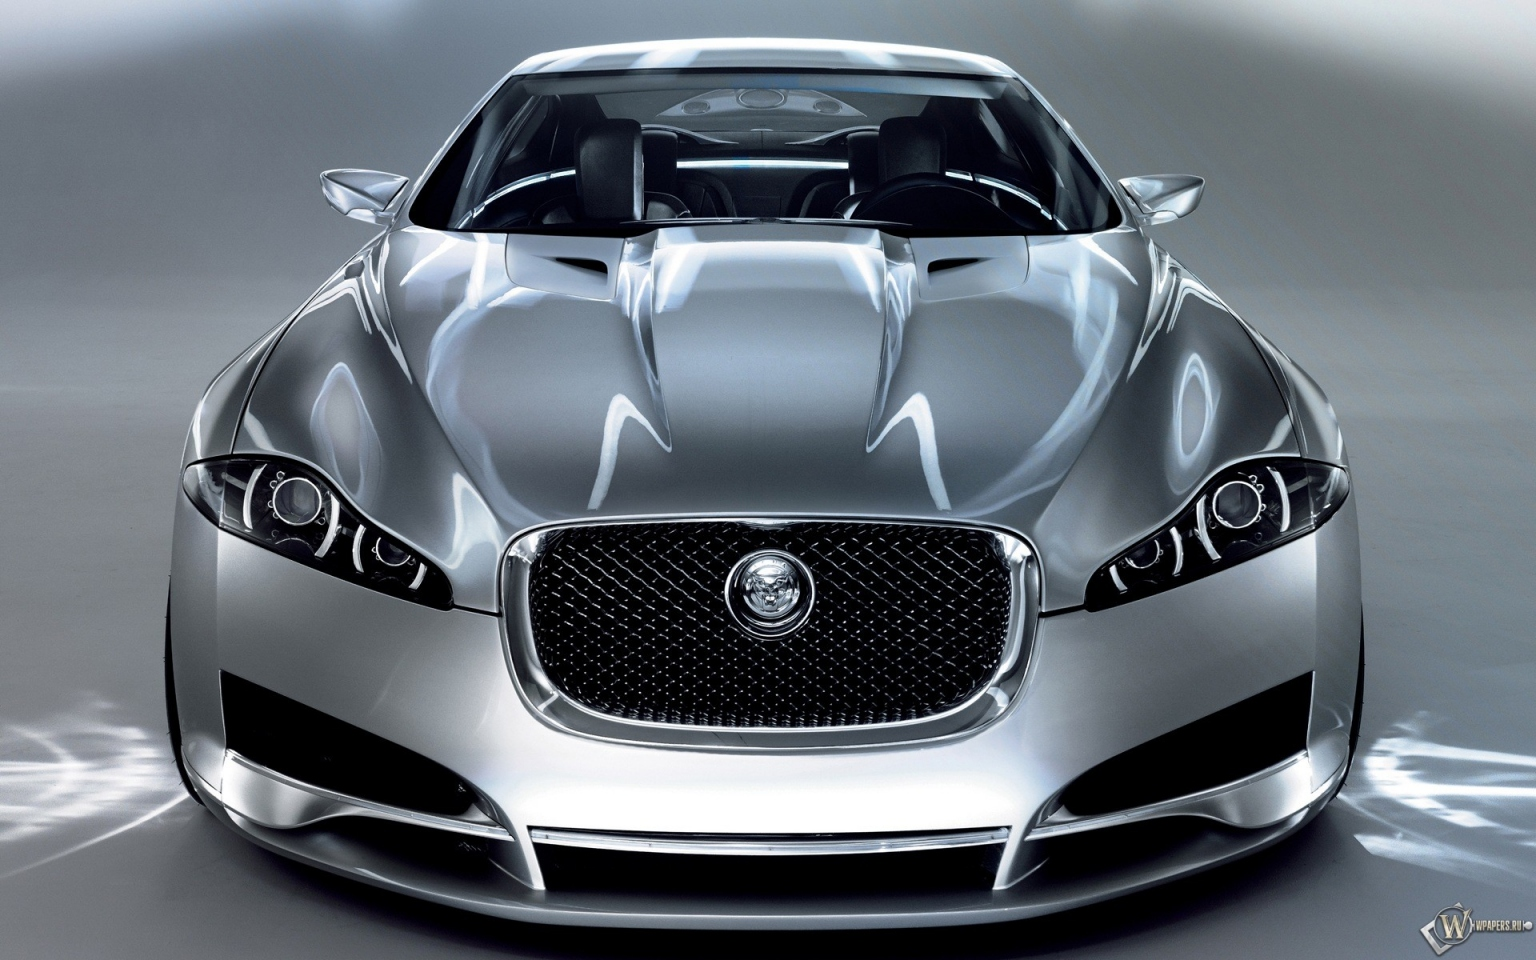 Jaguar C-XF 1536x960